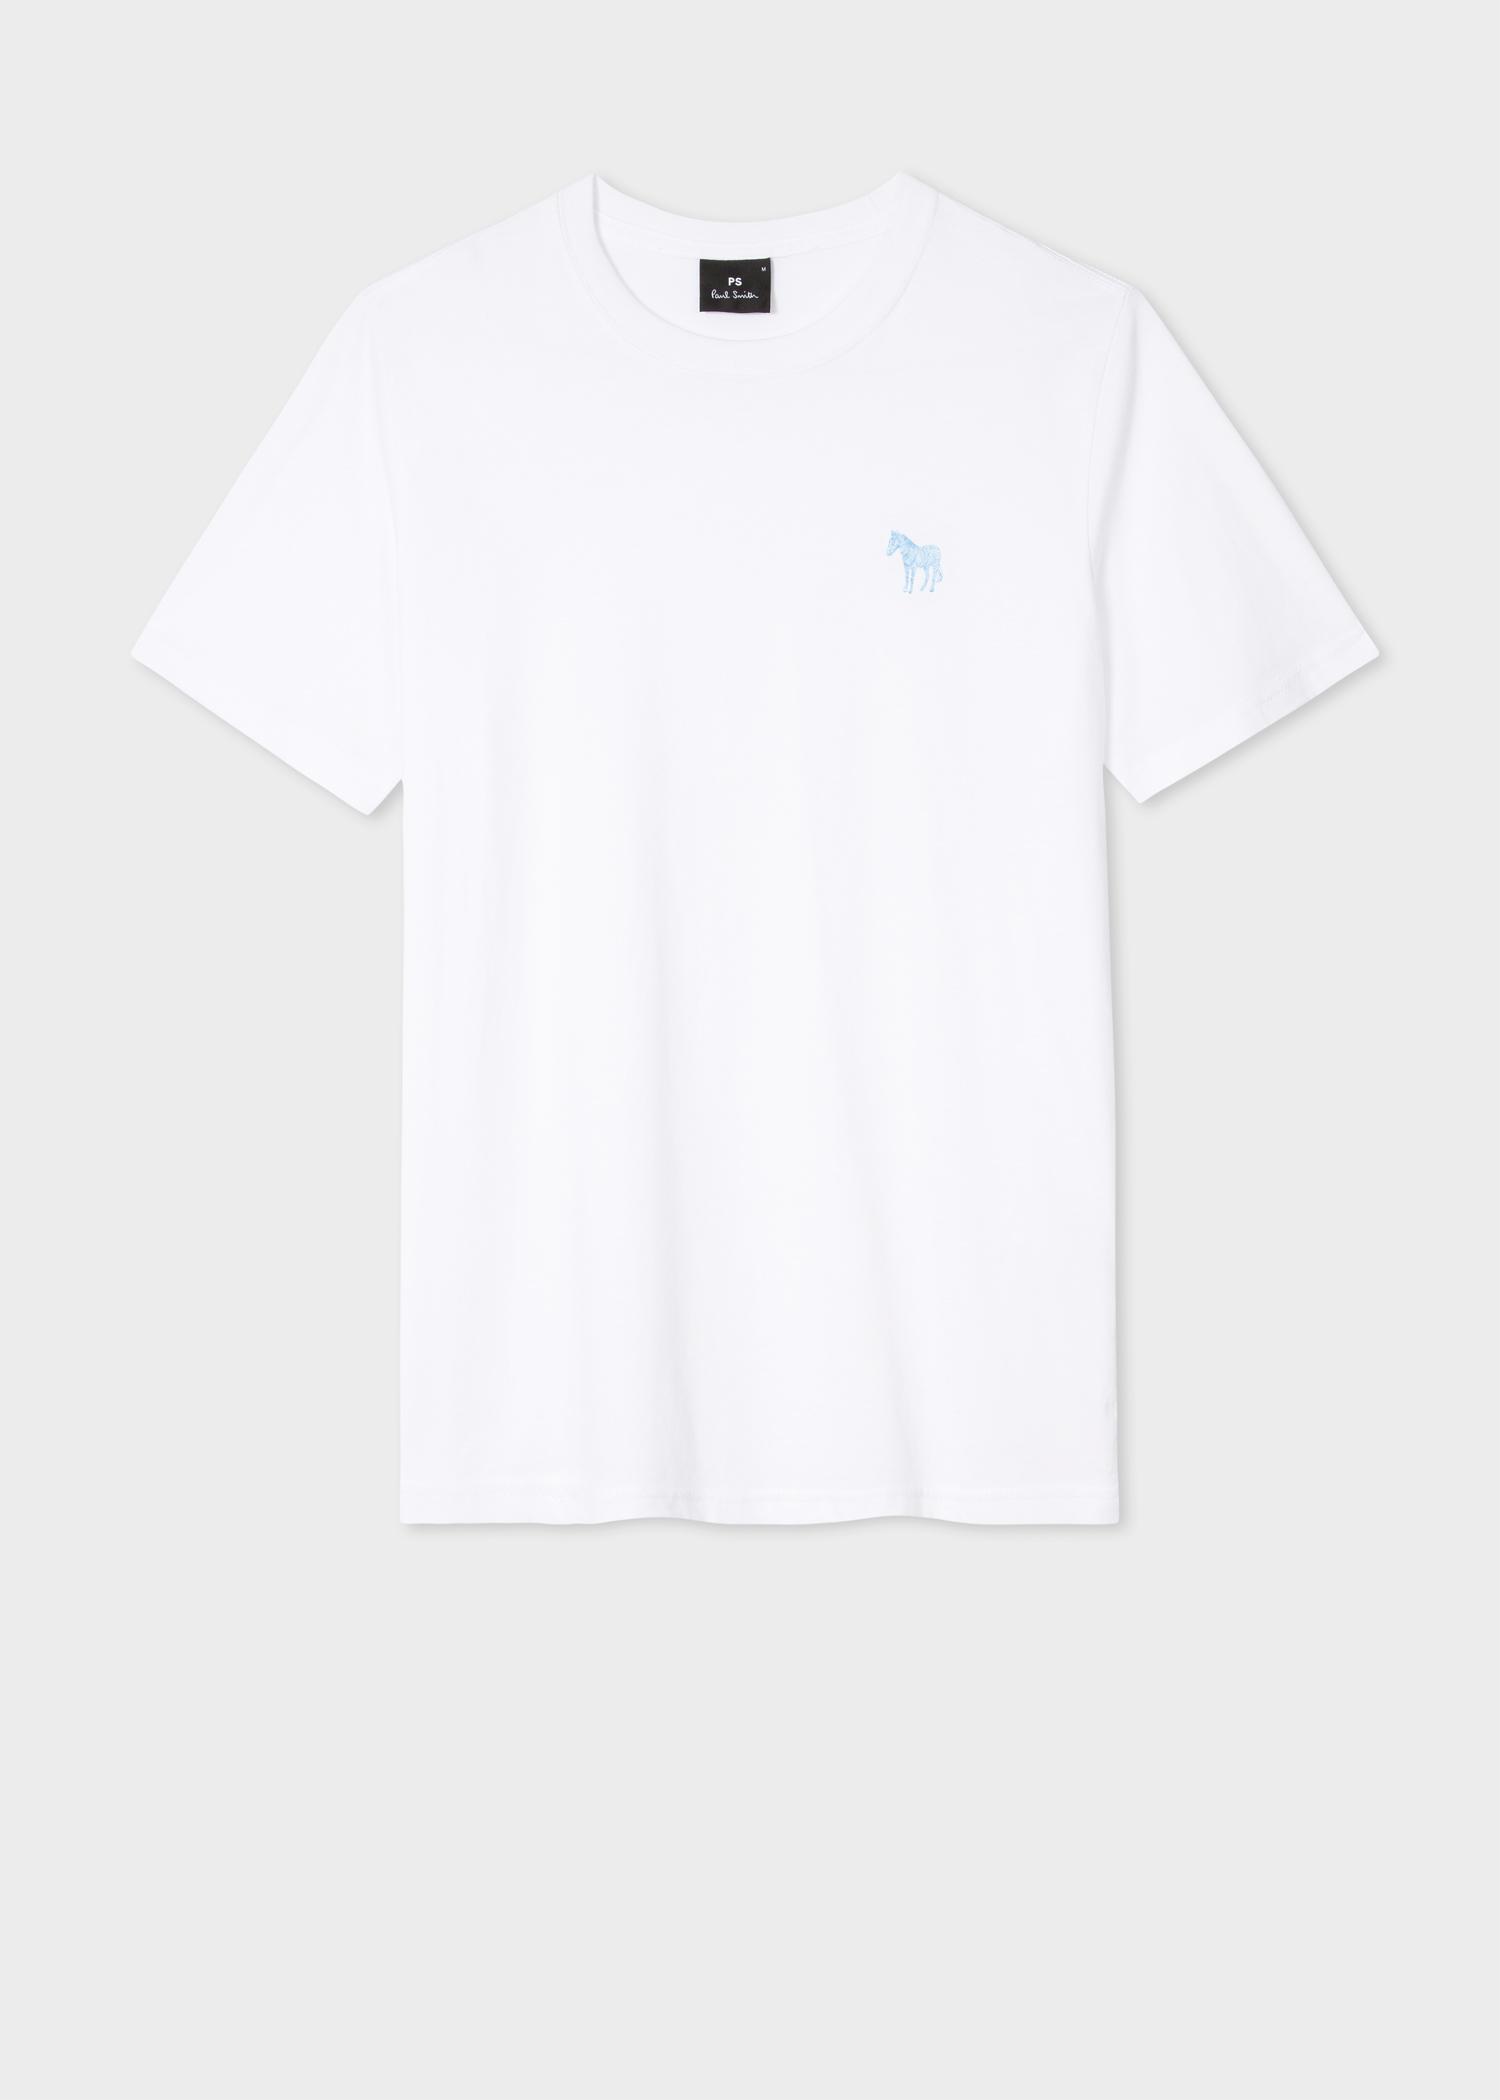 97d2de0a8ff Men's White Embroidered Zebra Organic-Cotton T-Shirt